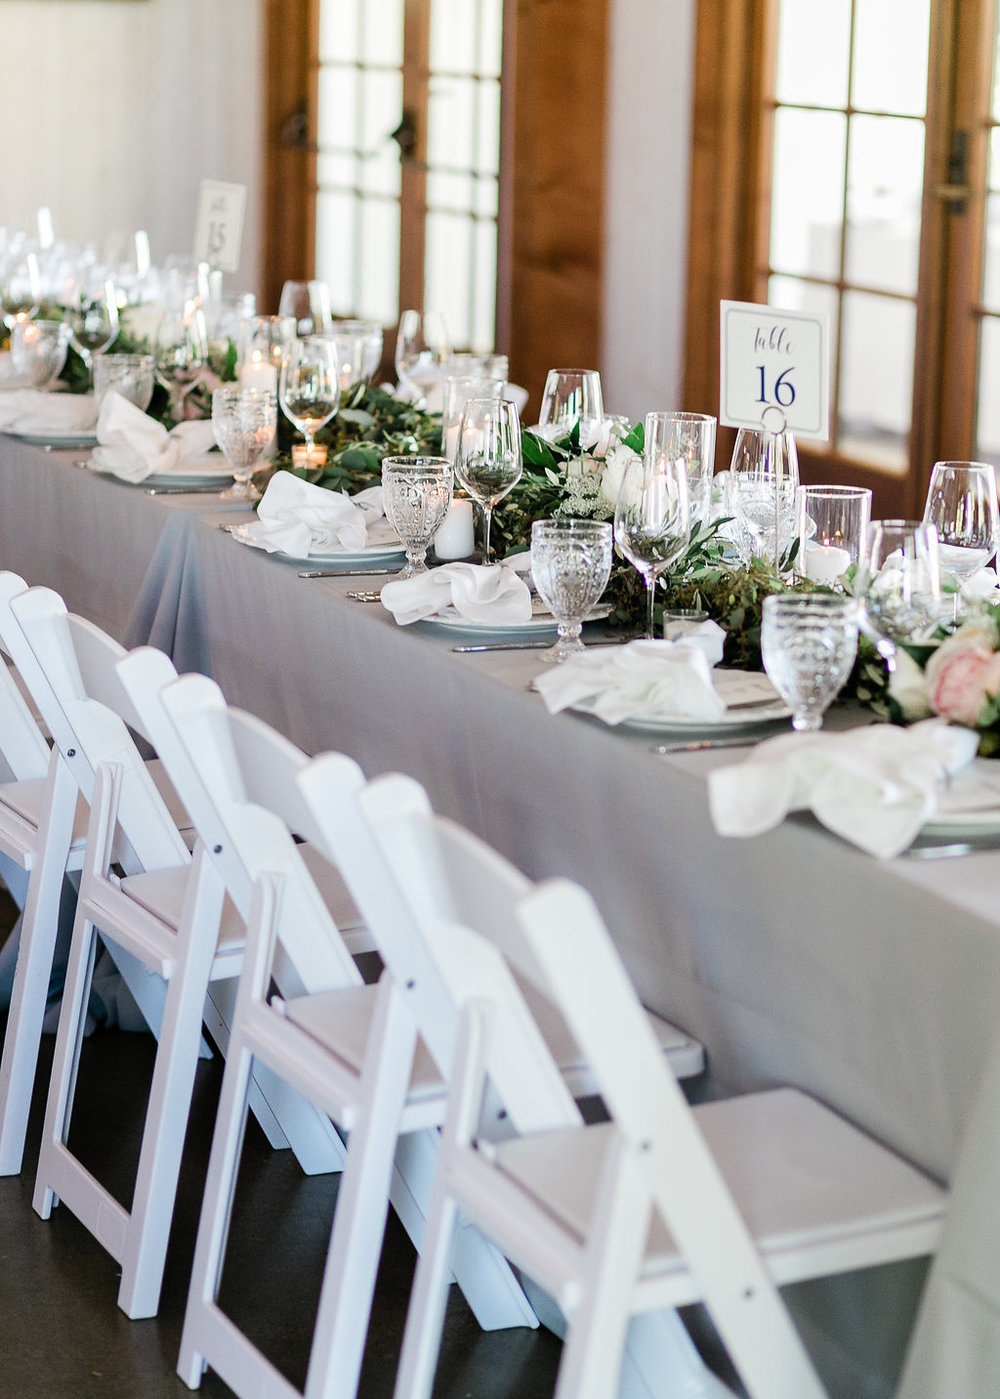 Park Winters Summer Wedding | Indoor Reception | Barn Wedding | Neutral Wedding | Wedding Table | Grey and white wedding